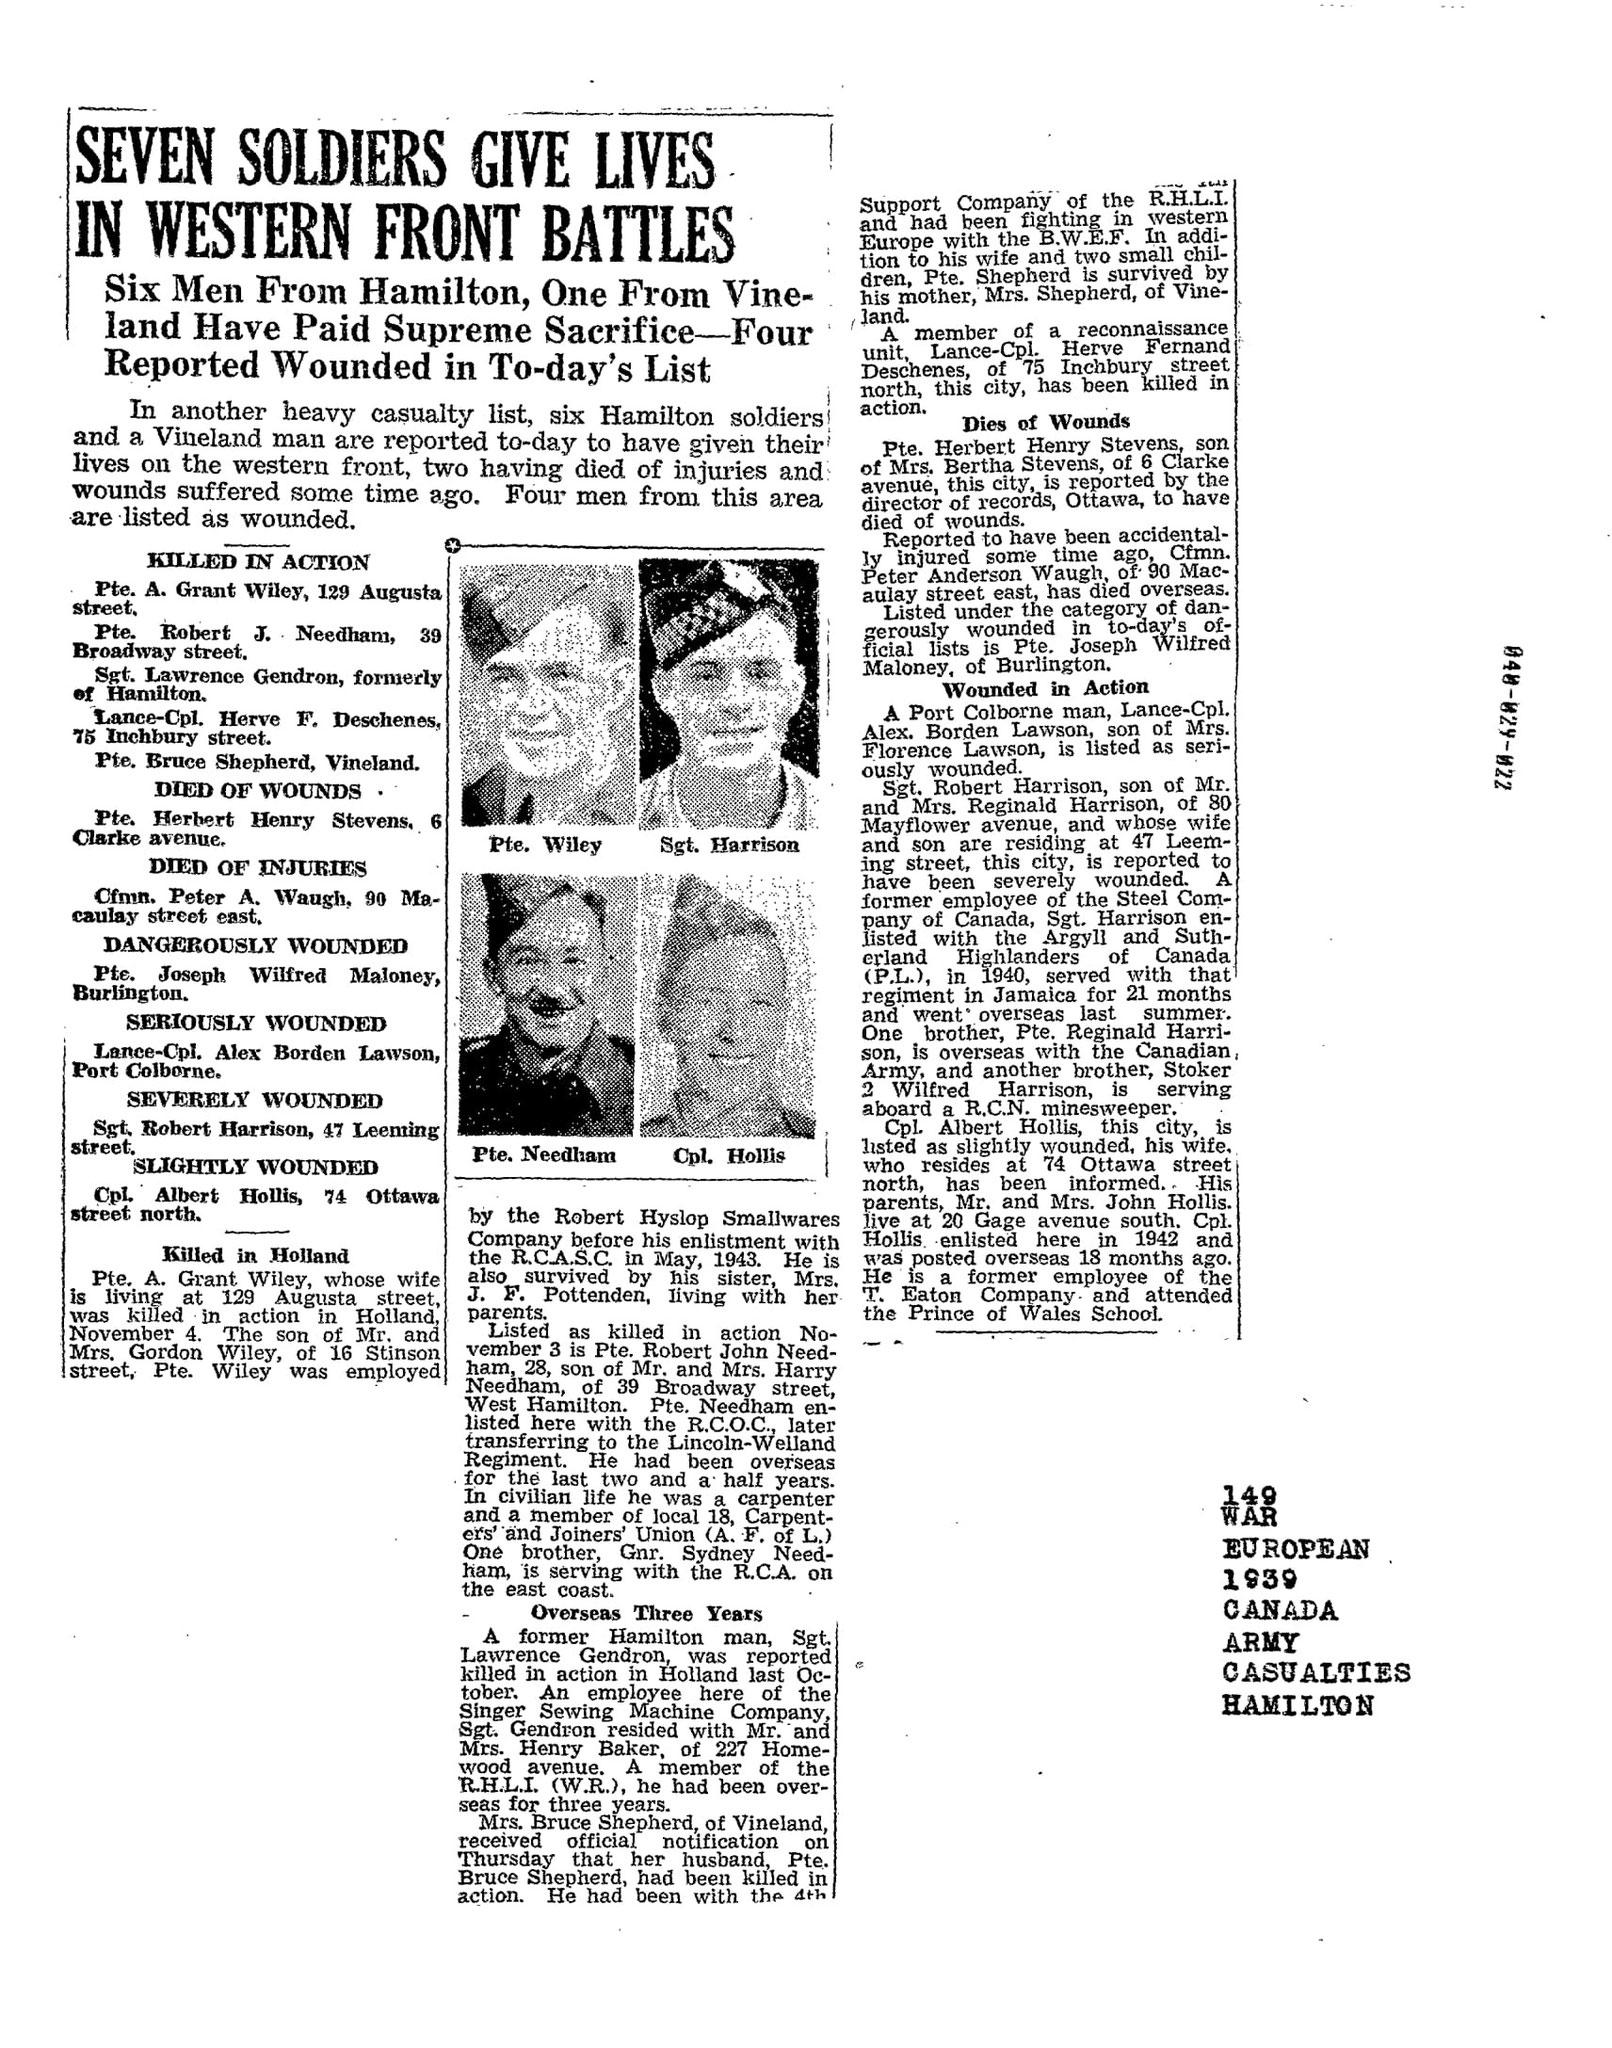 Hamilton Spectator 11-11-1944